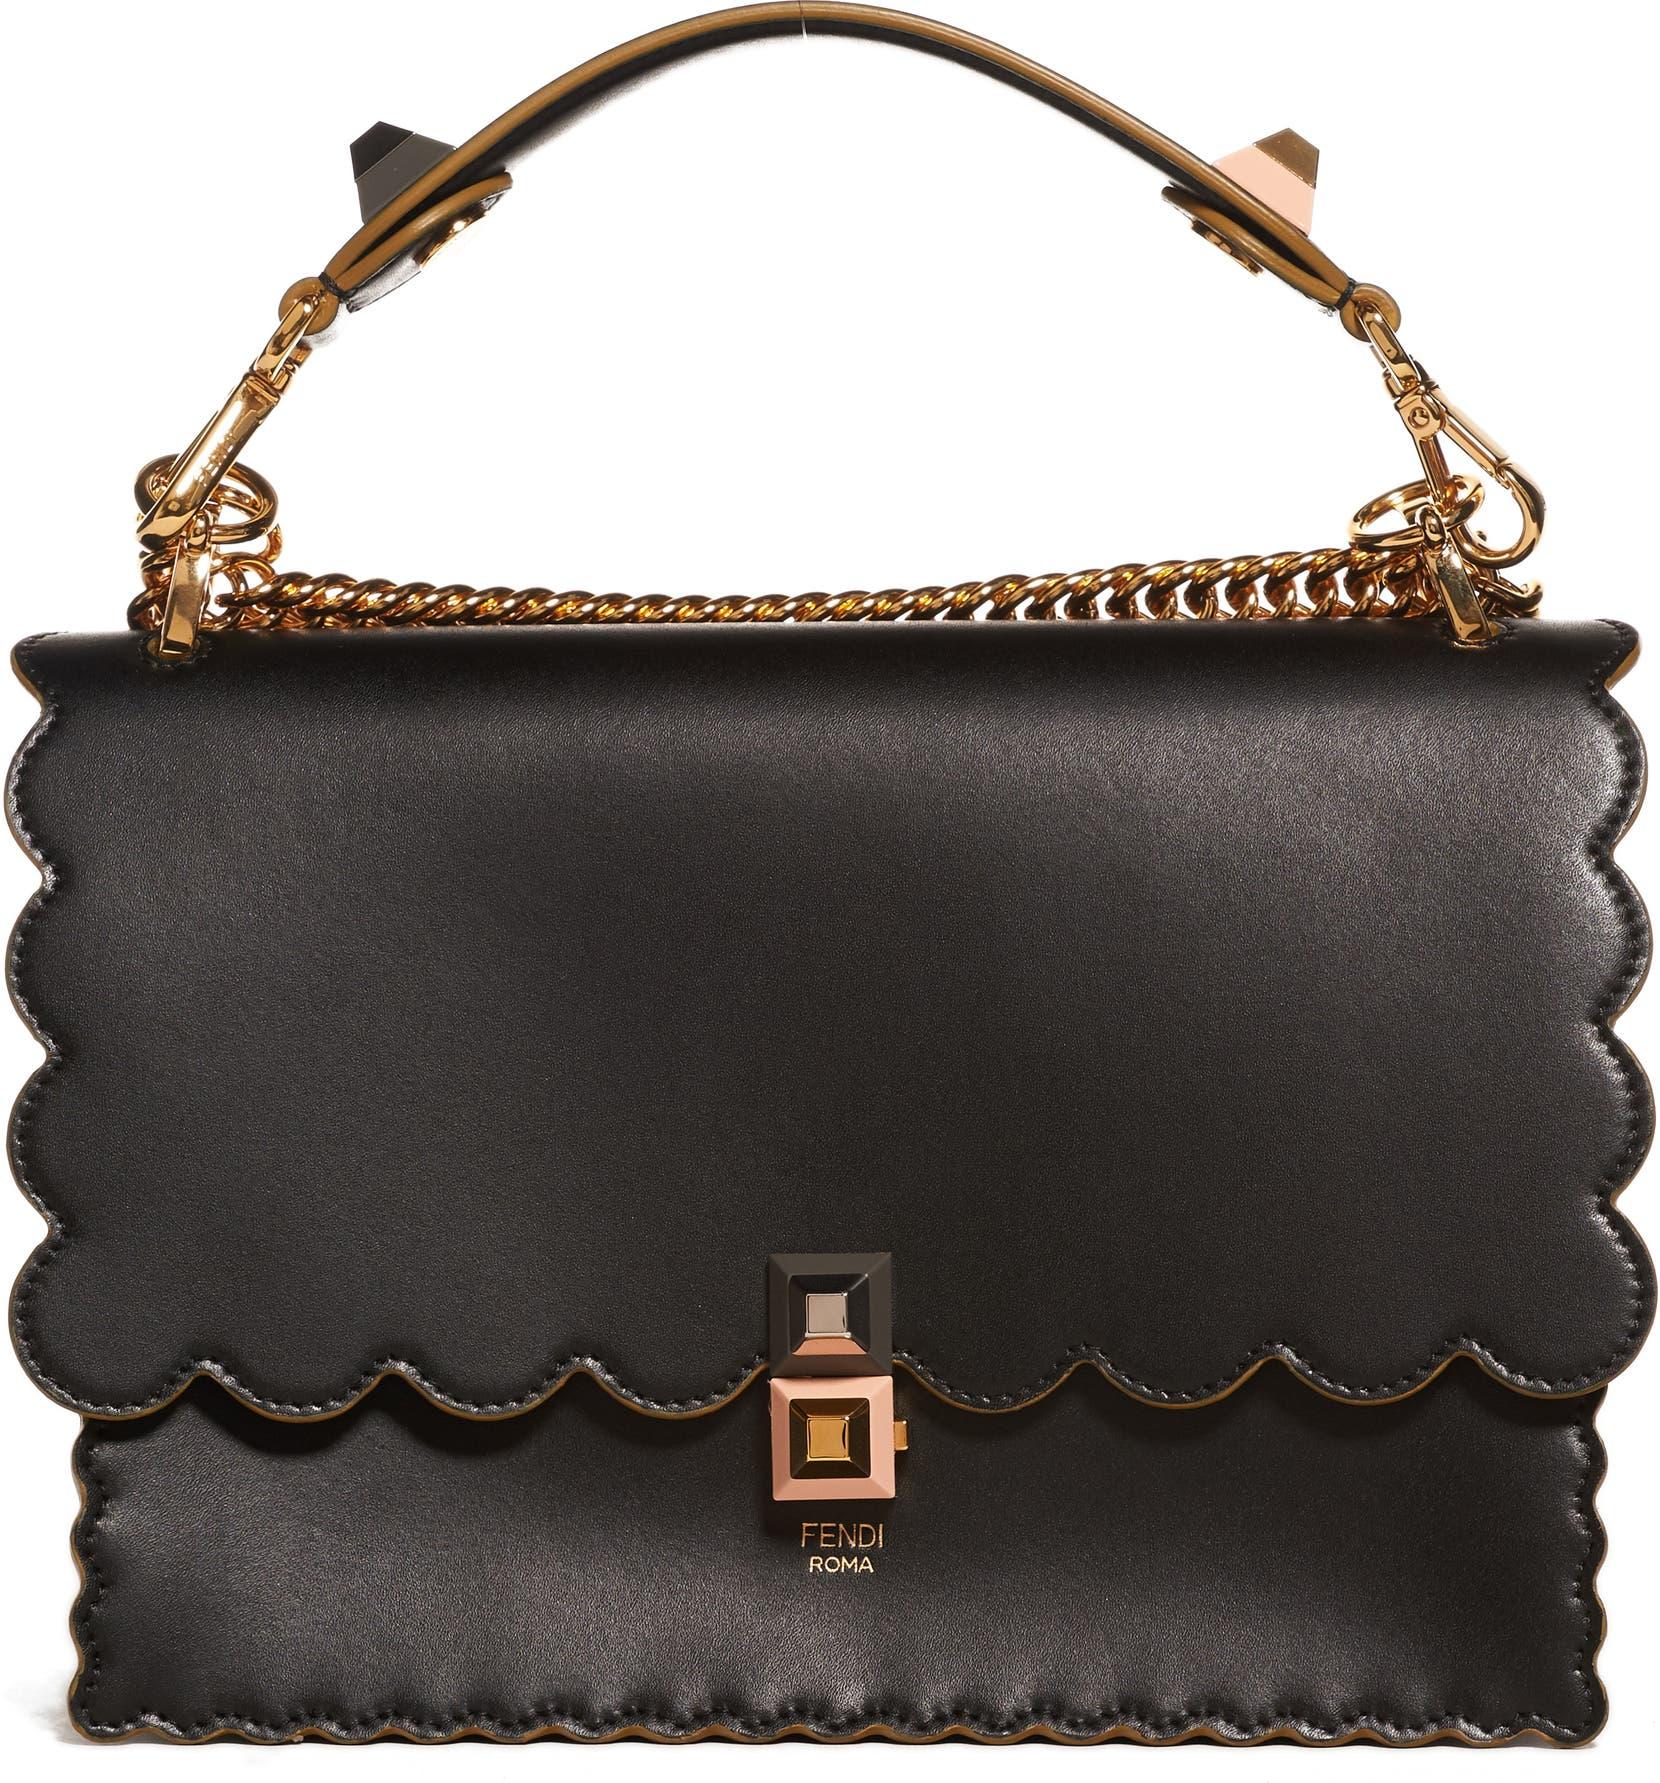 c2e726cd6f61 Fendi Kan I Scallop Leather Shoulder Bag